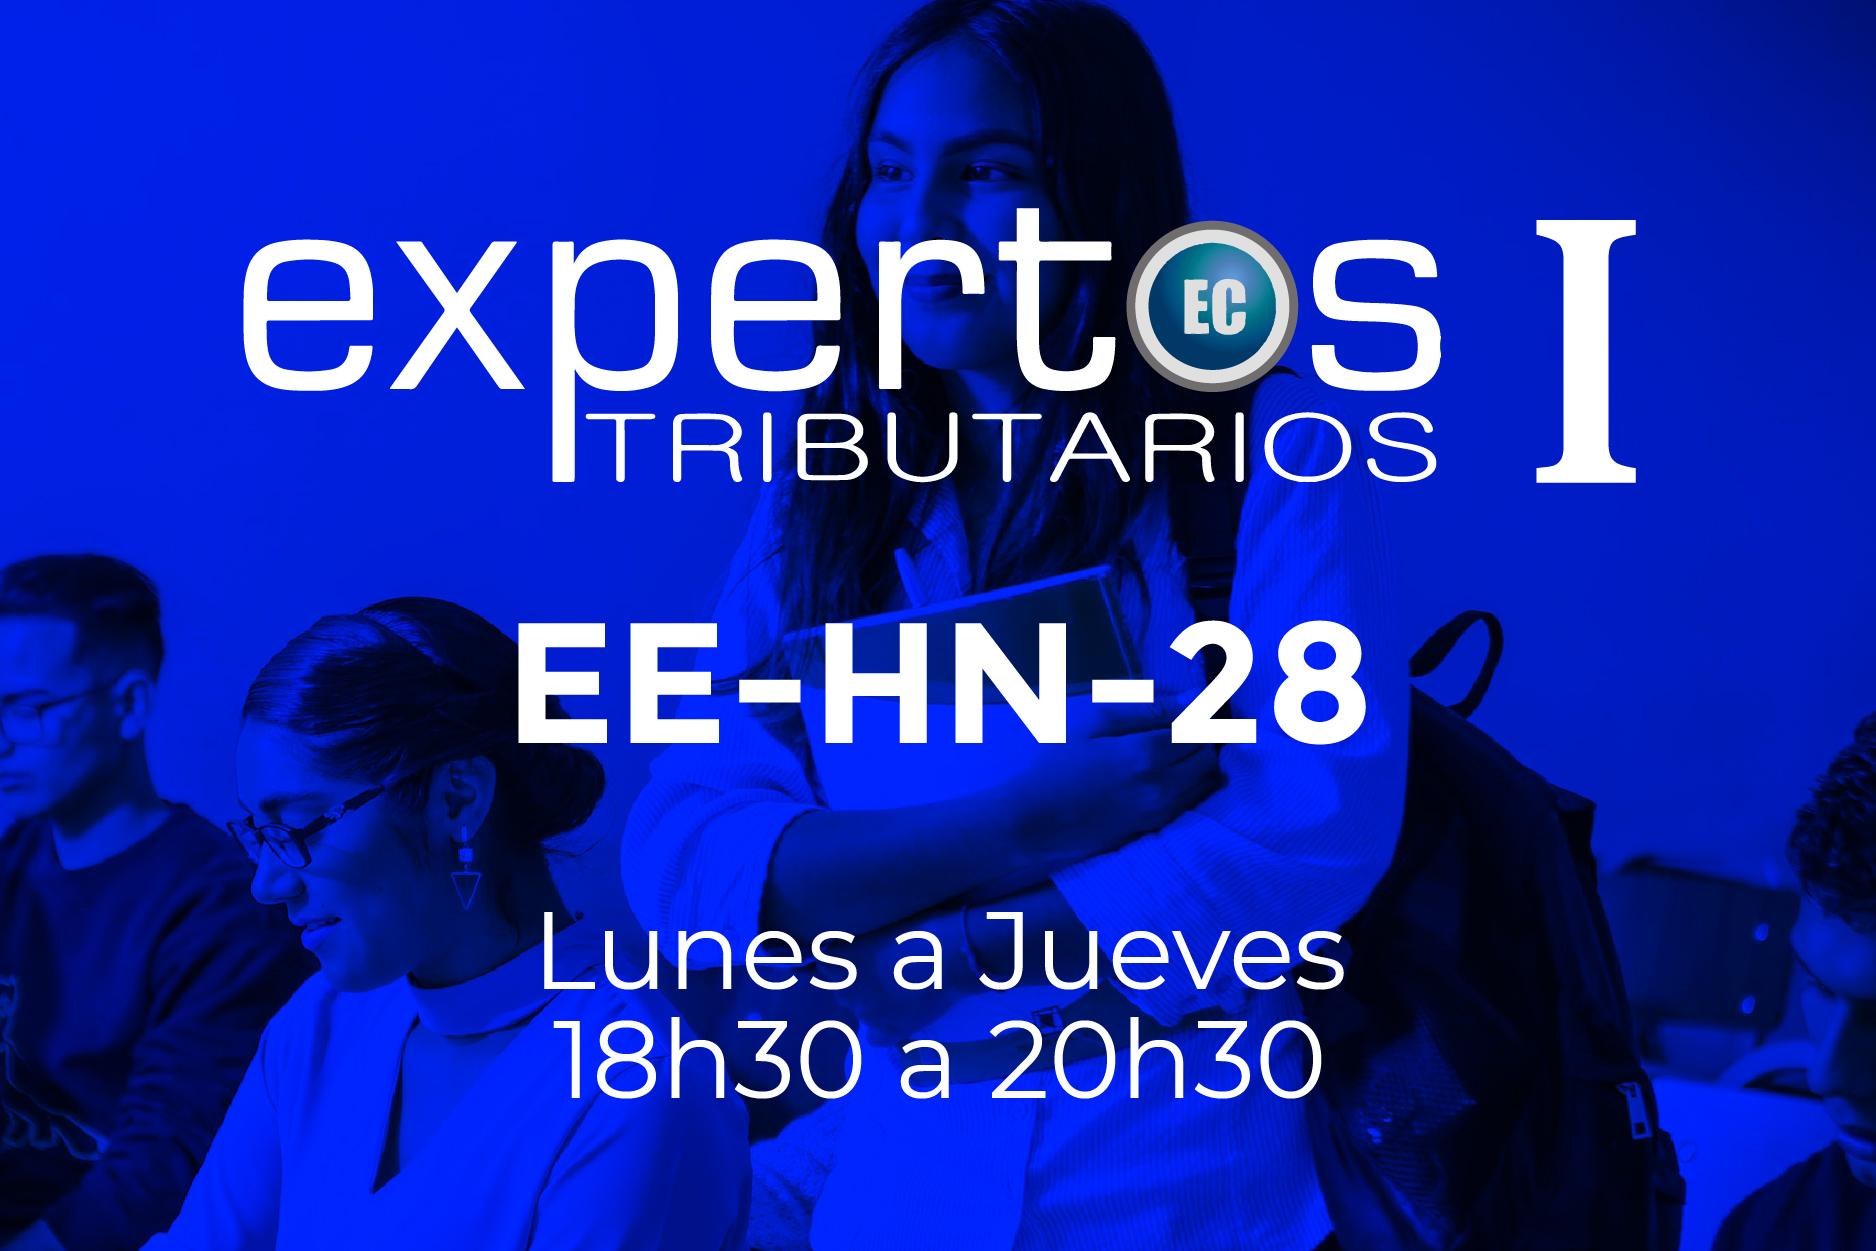 28 - EXPERTOS TRIBUTARIOS - LUNES A JUEVES - 18:00 A 20:30